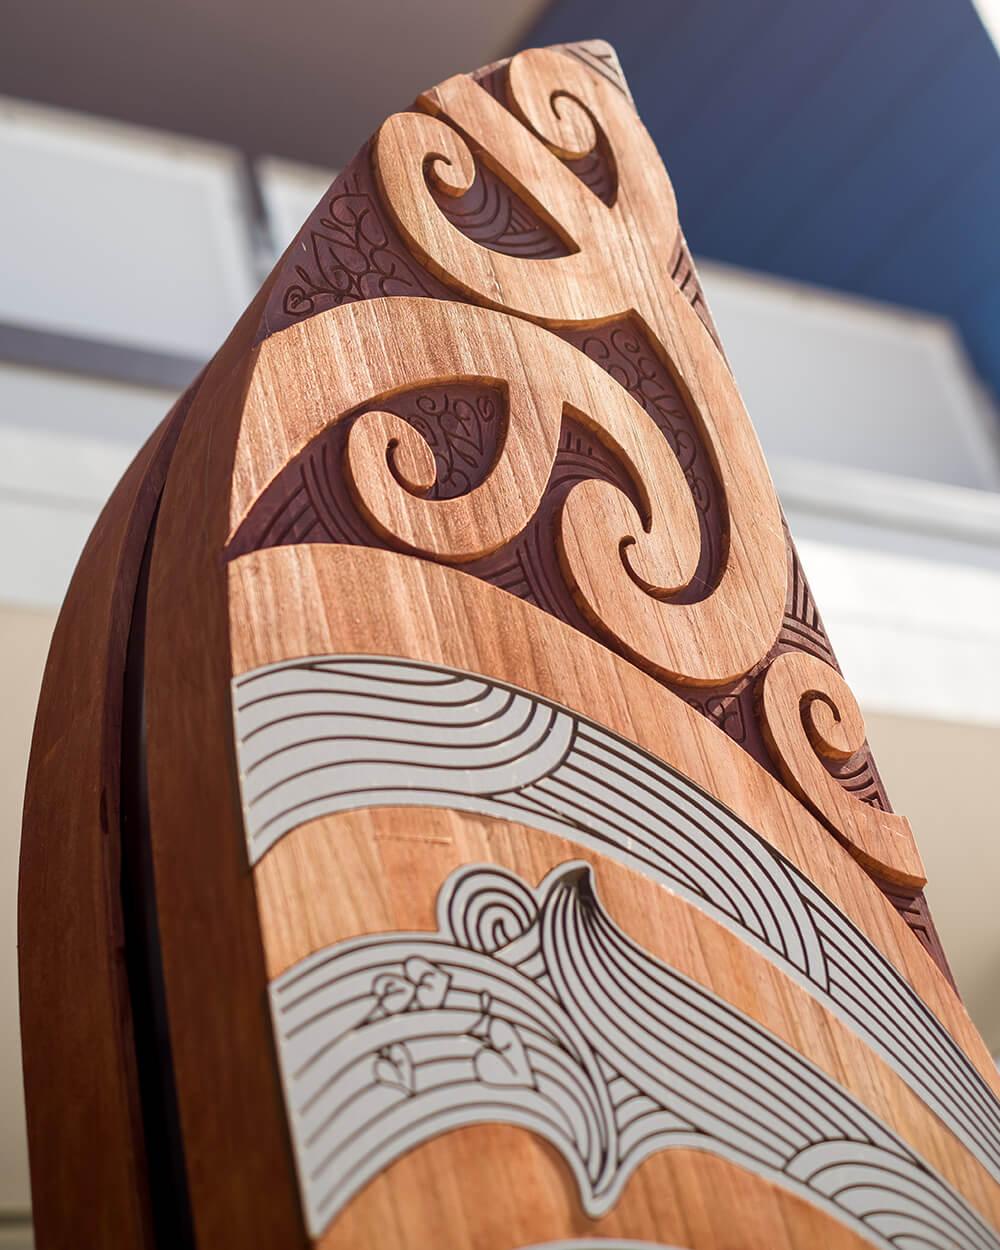 Pou form the waharoa (entry) to the school